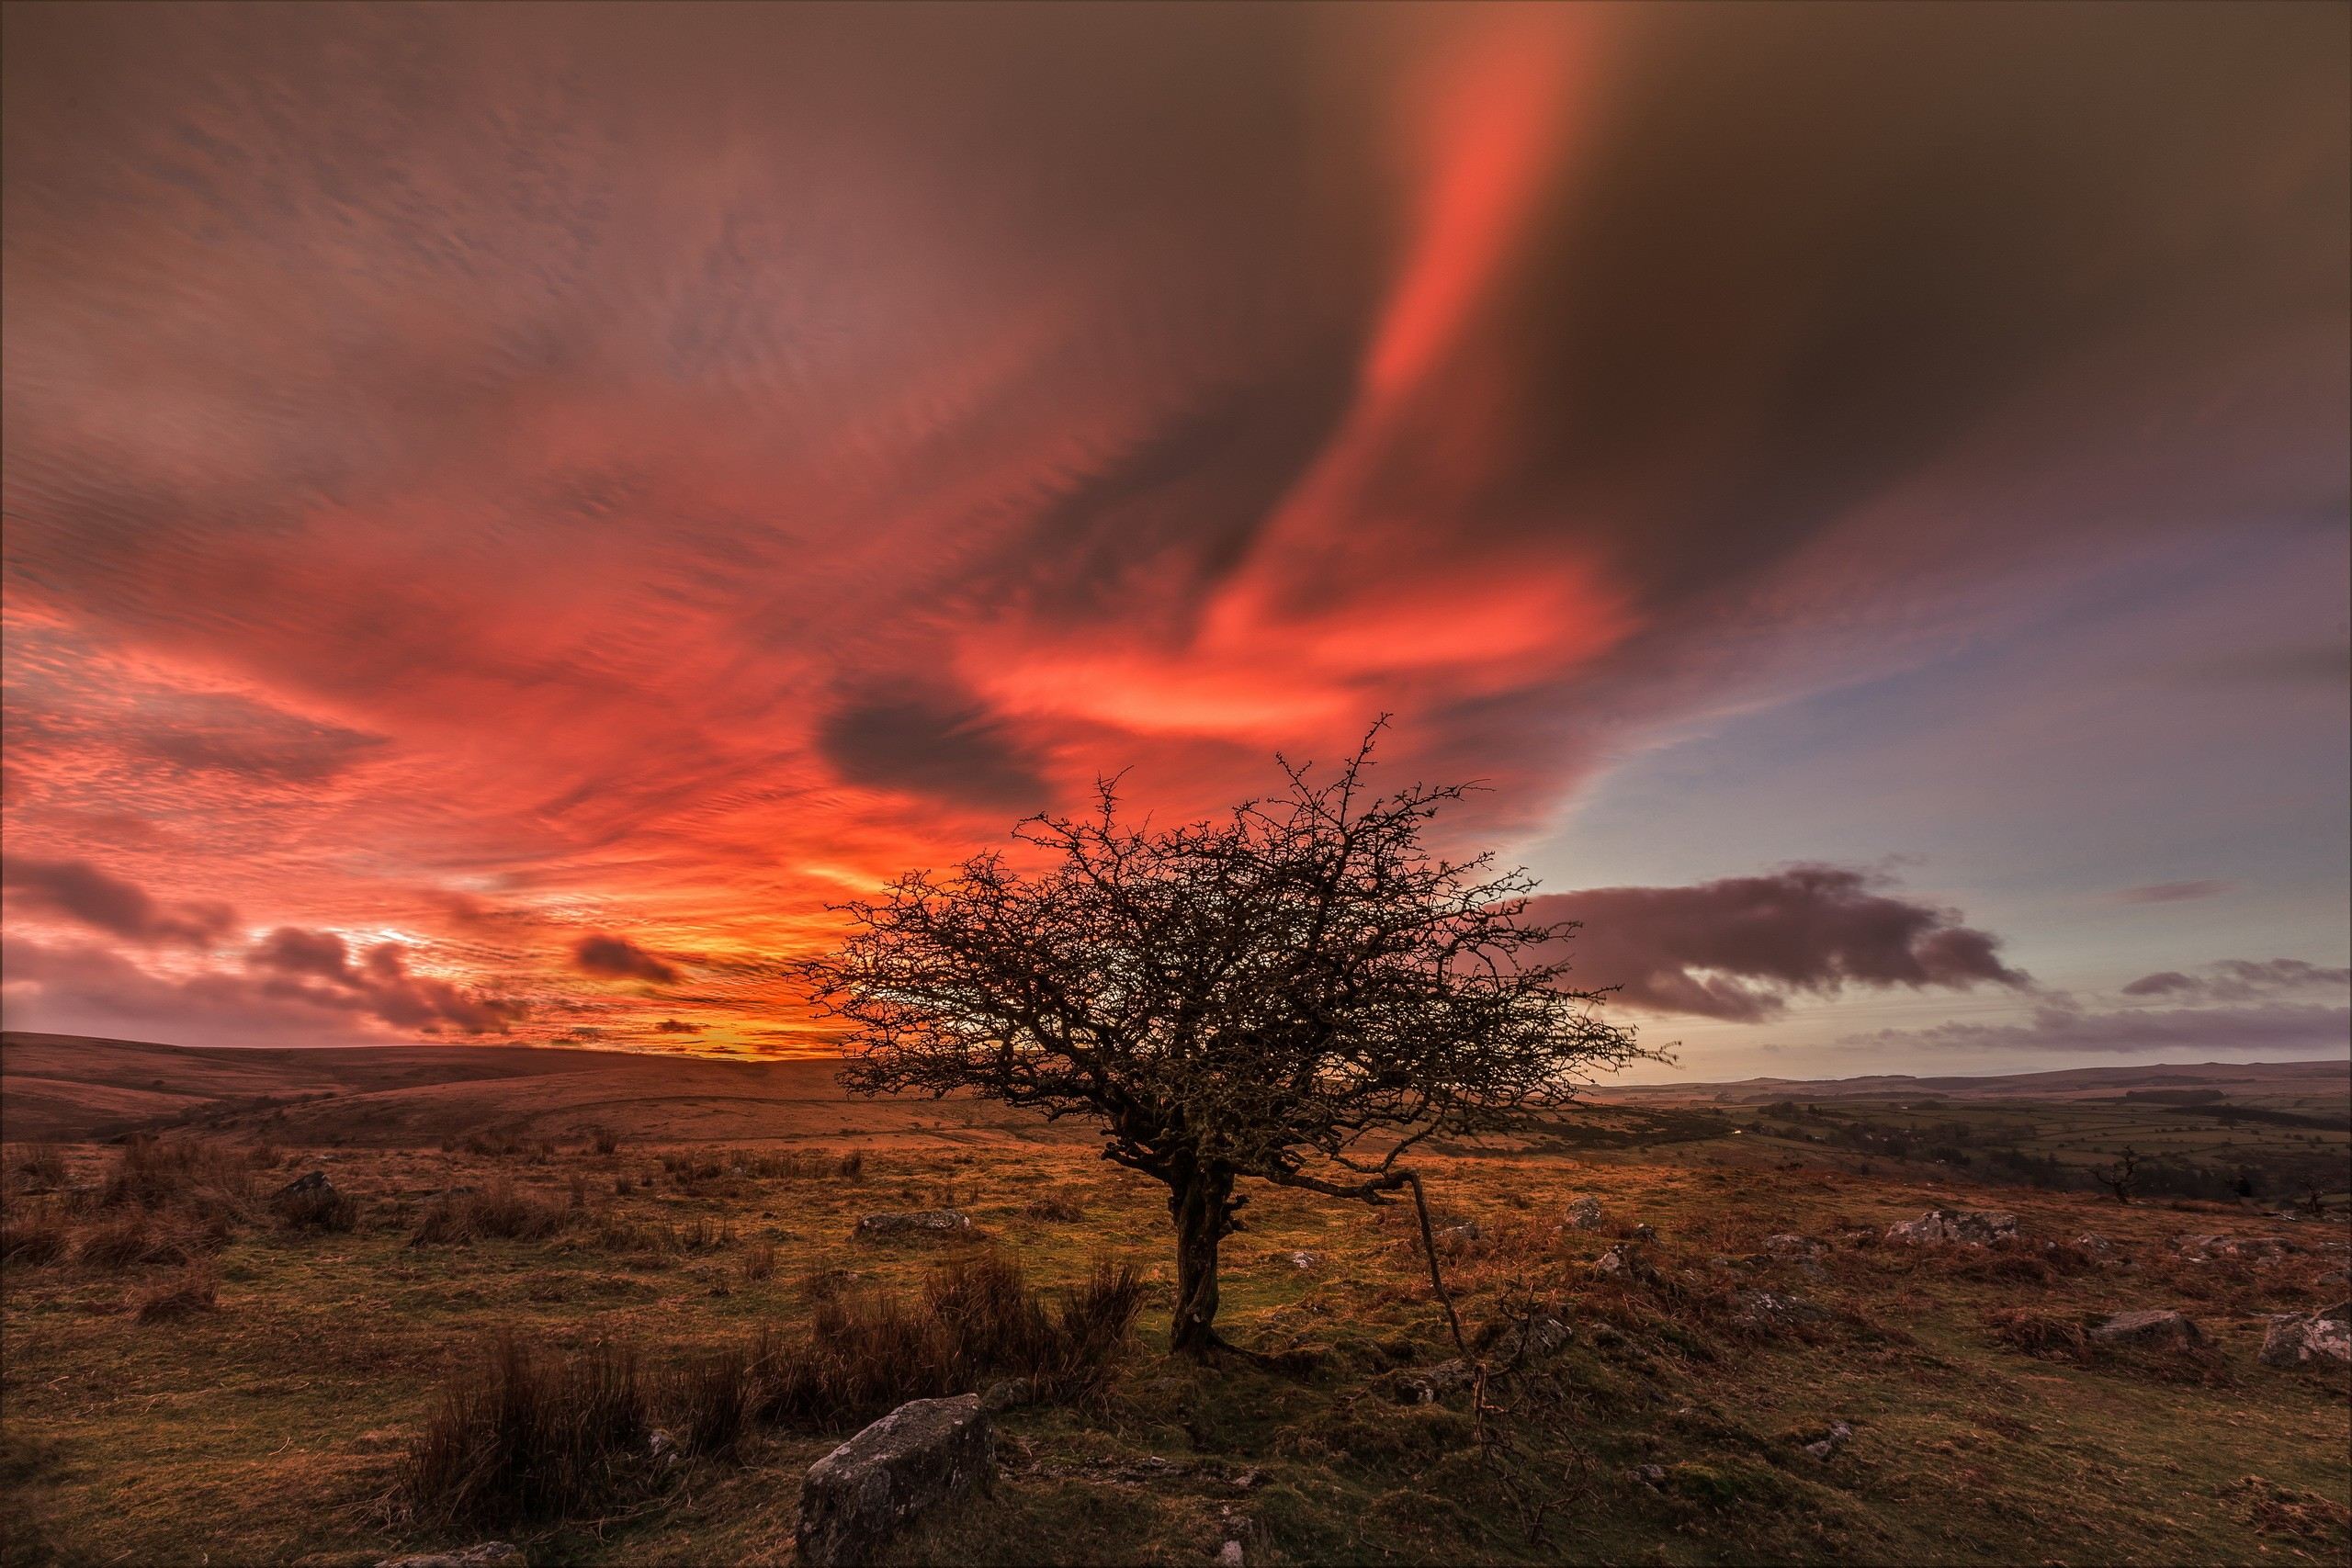 Landscape, HD Nature, 4k Wallpapers, Images, Backgrounds ...